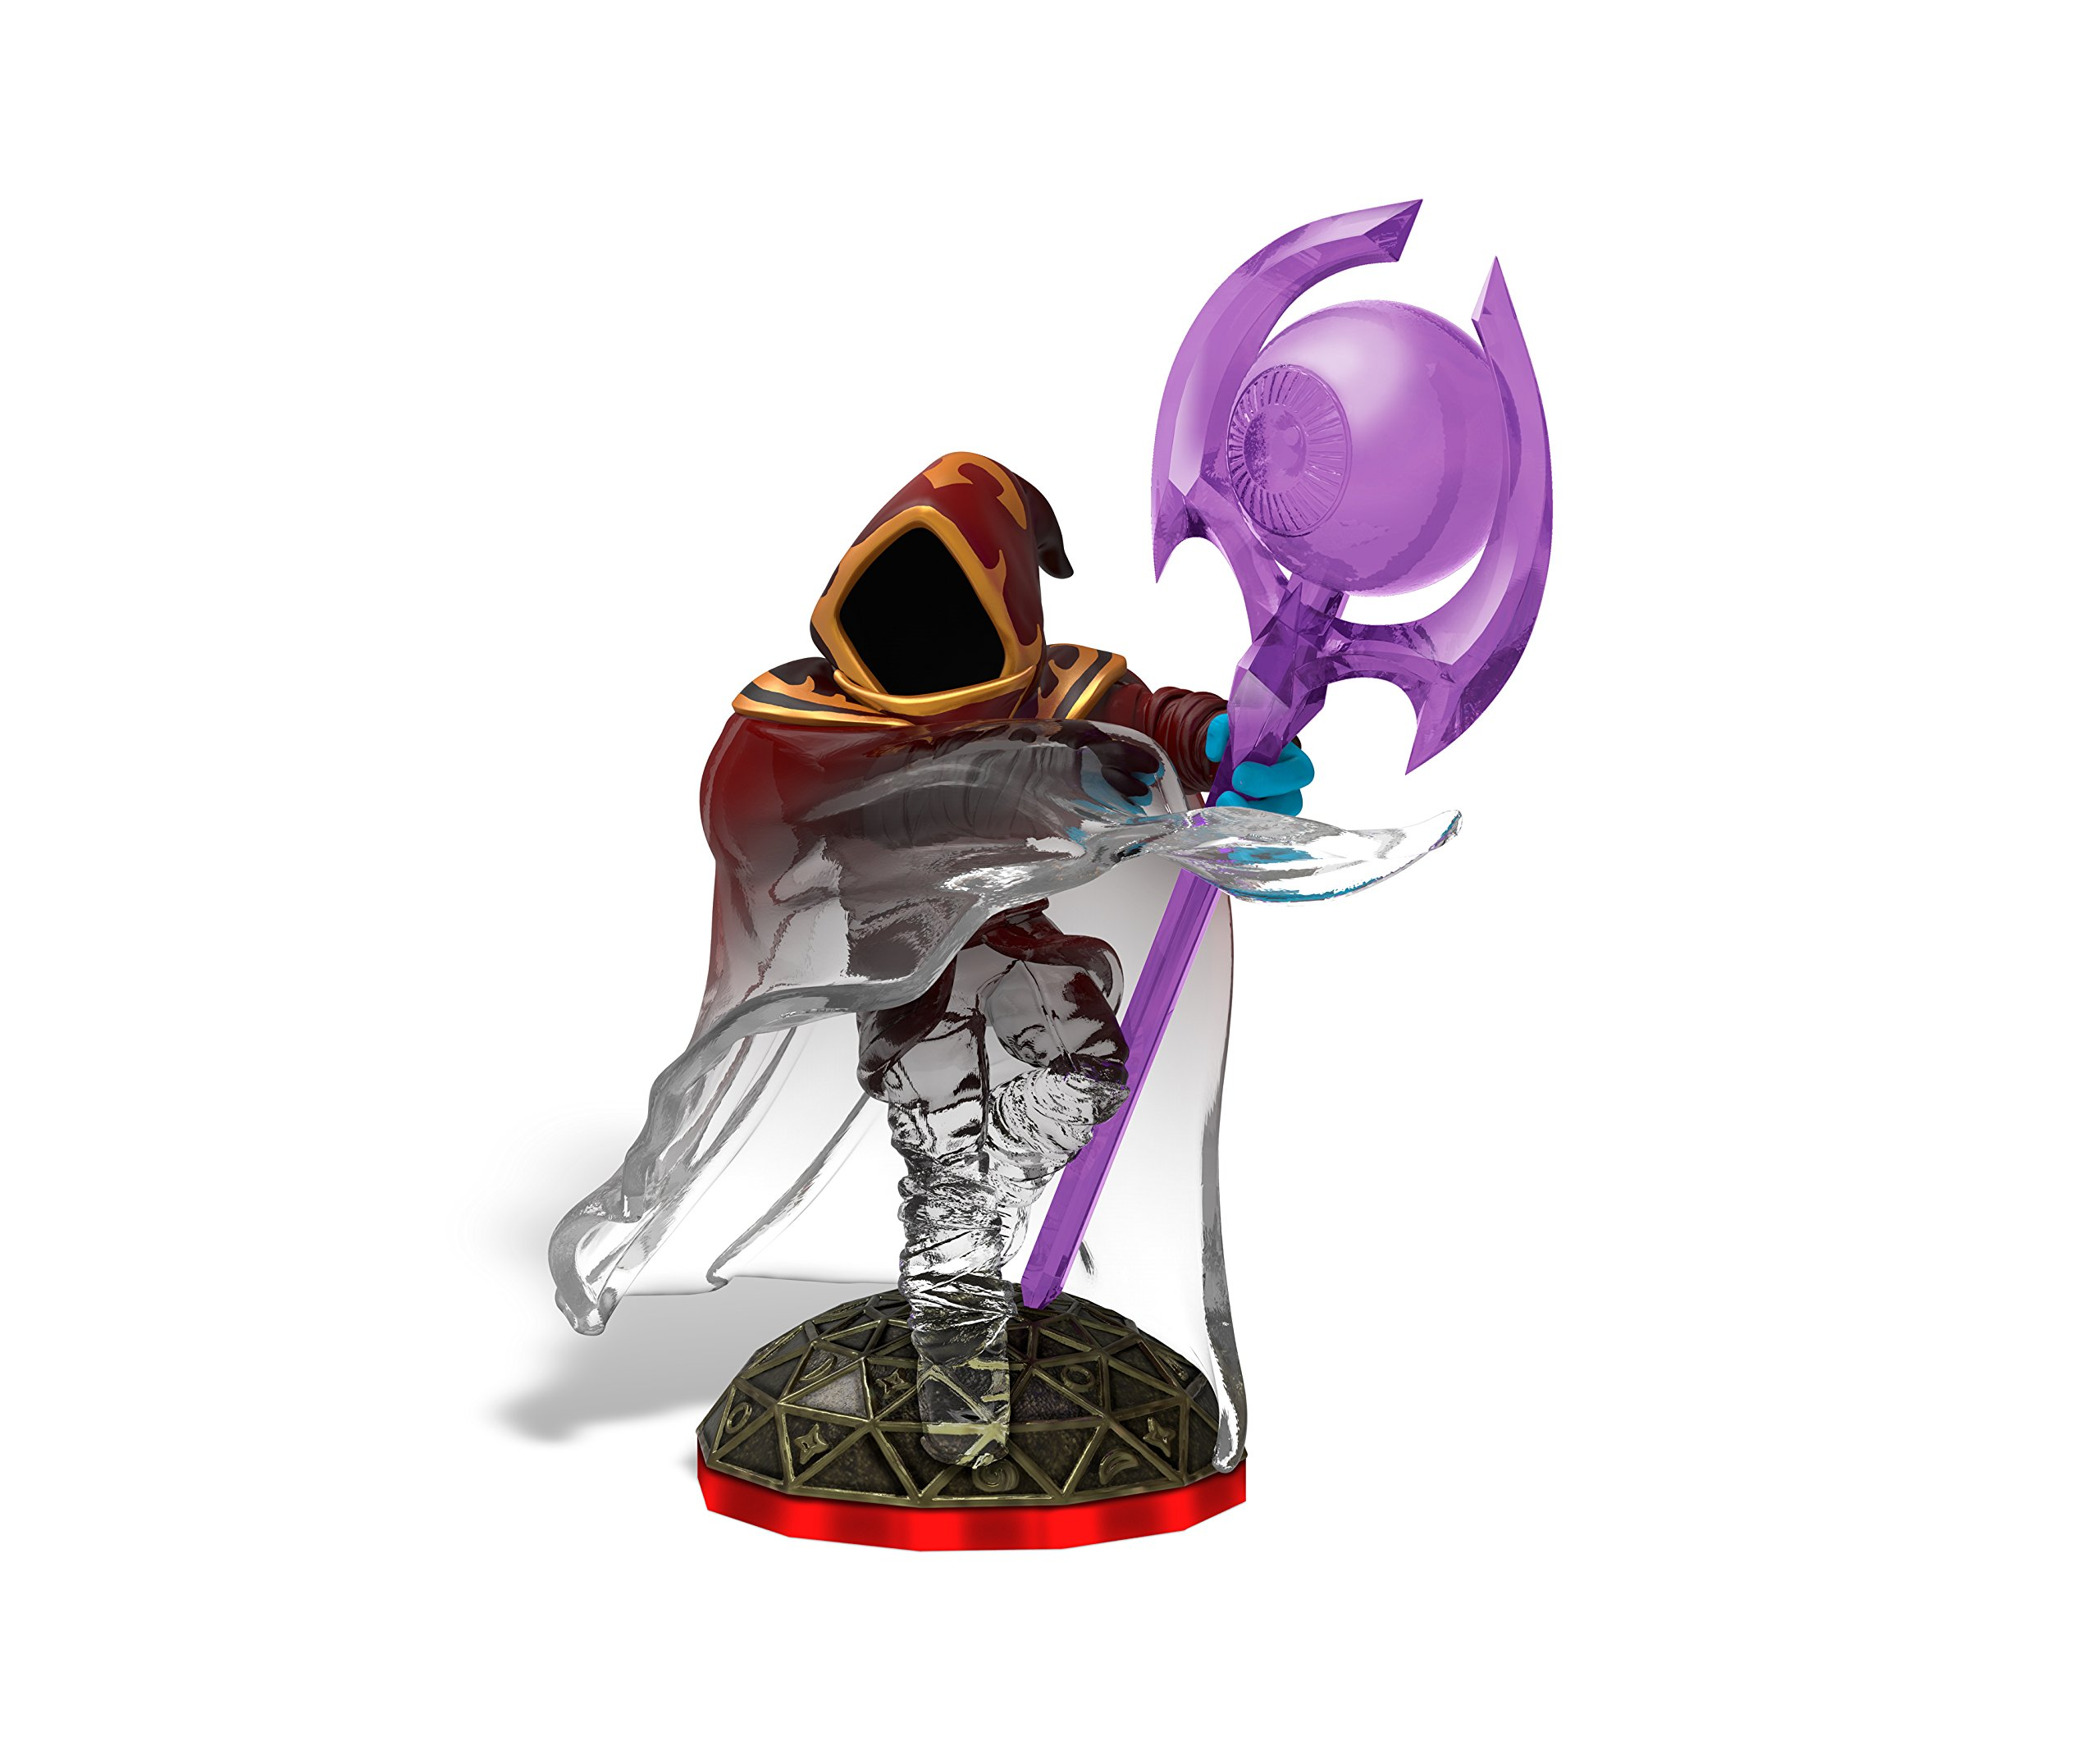 Skylanders Trap Team: Trap Master Enigma Character Pack